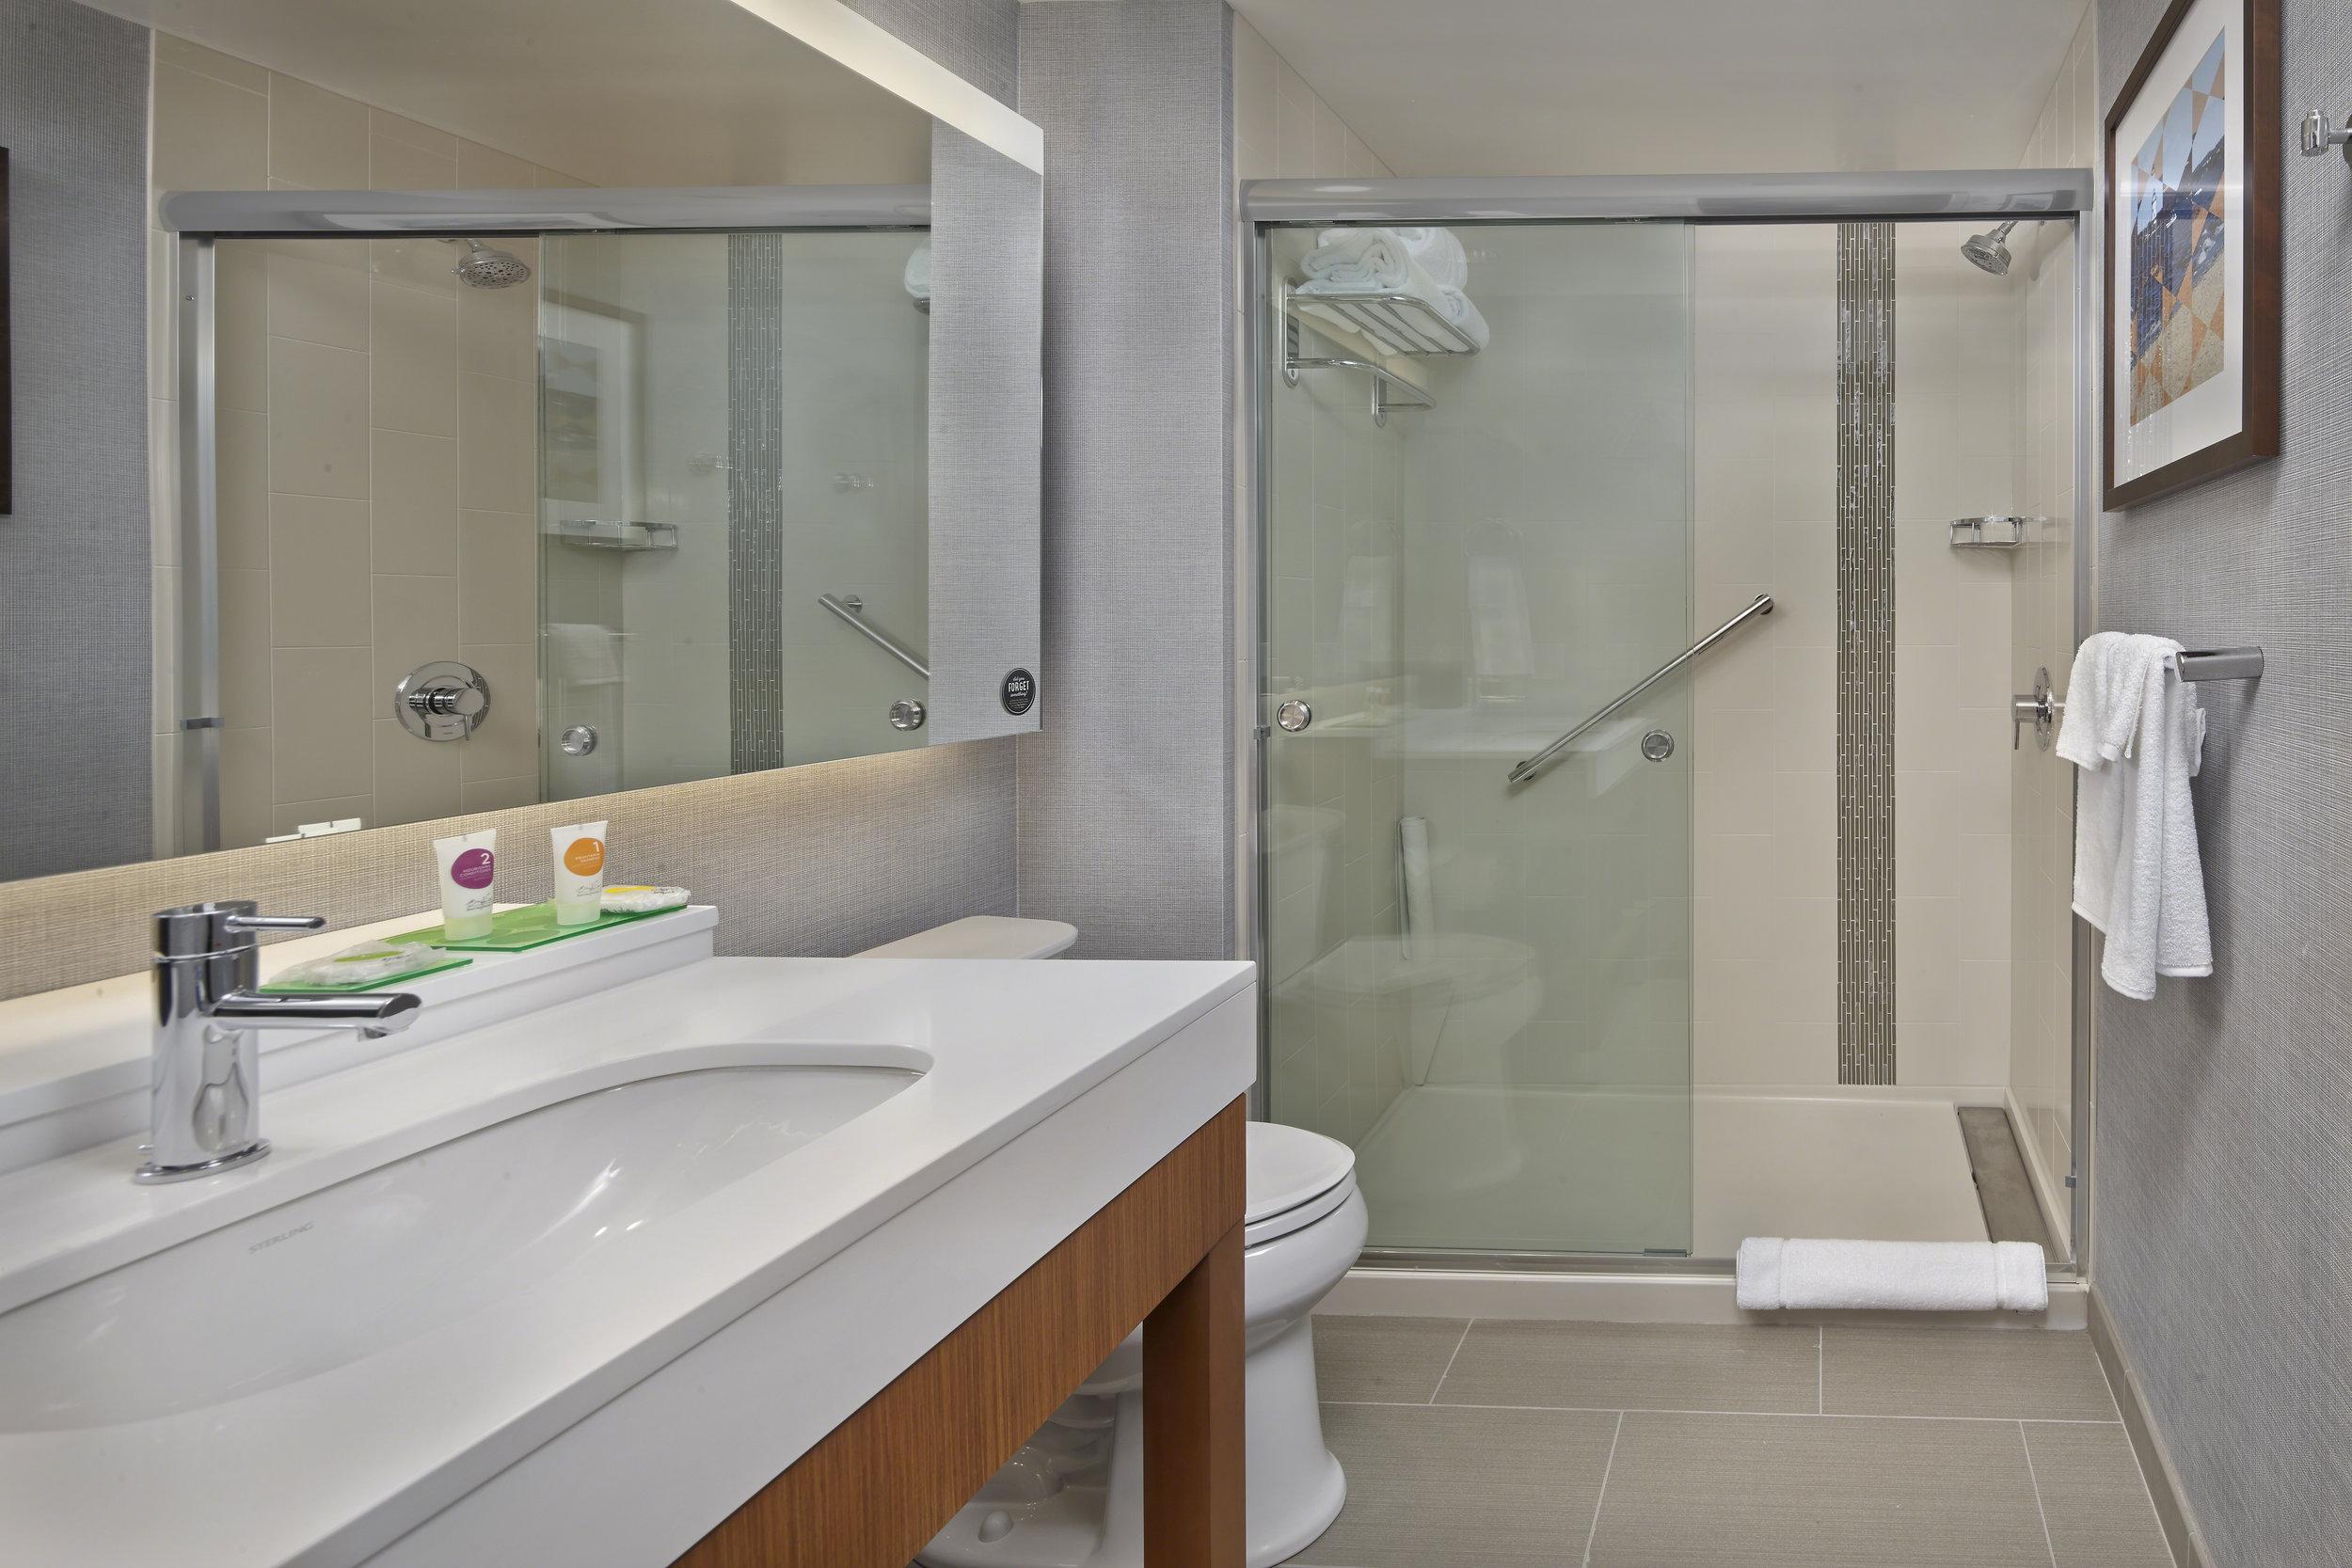 Hyatt_Place_Hotel_Warwick_7_18_standard_bath-60mb.jpg